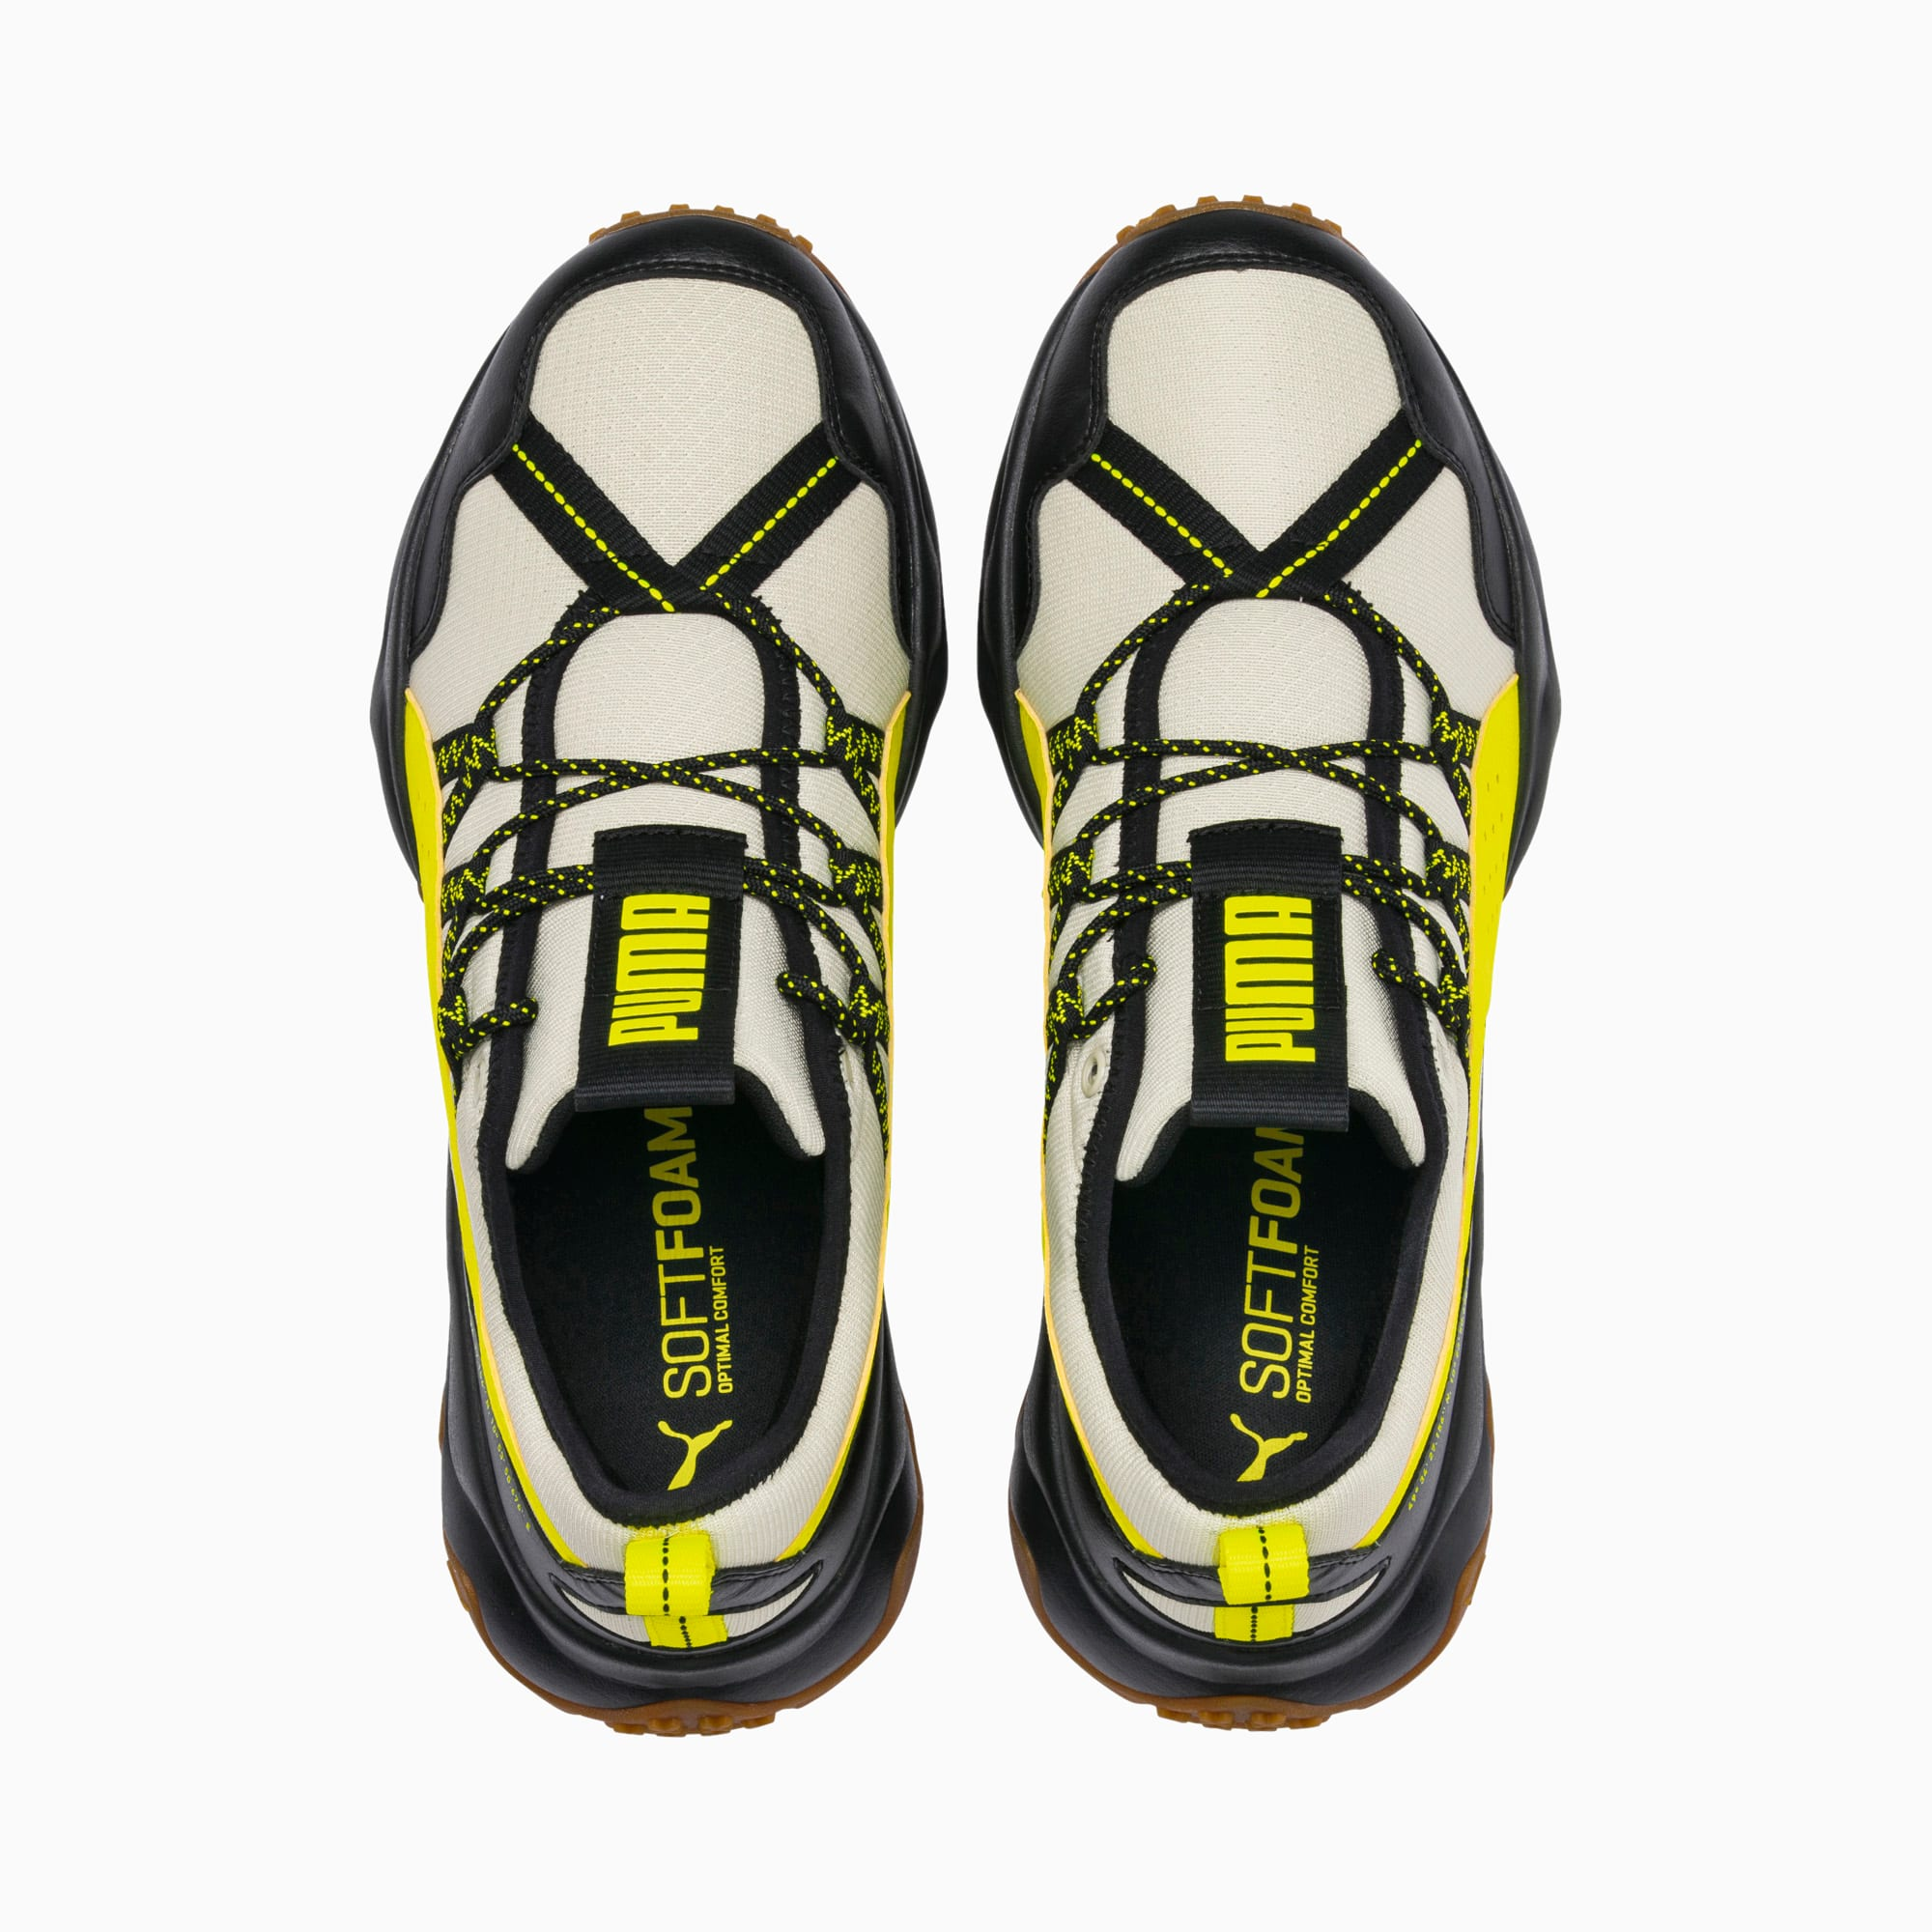 Comfortable PUMA Performance Running Shoes for Men PUMA